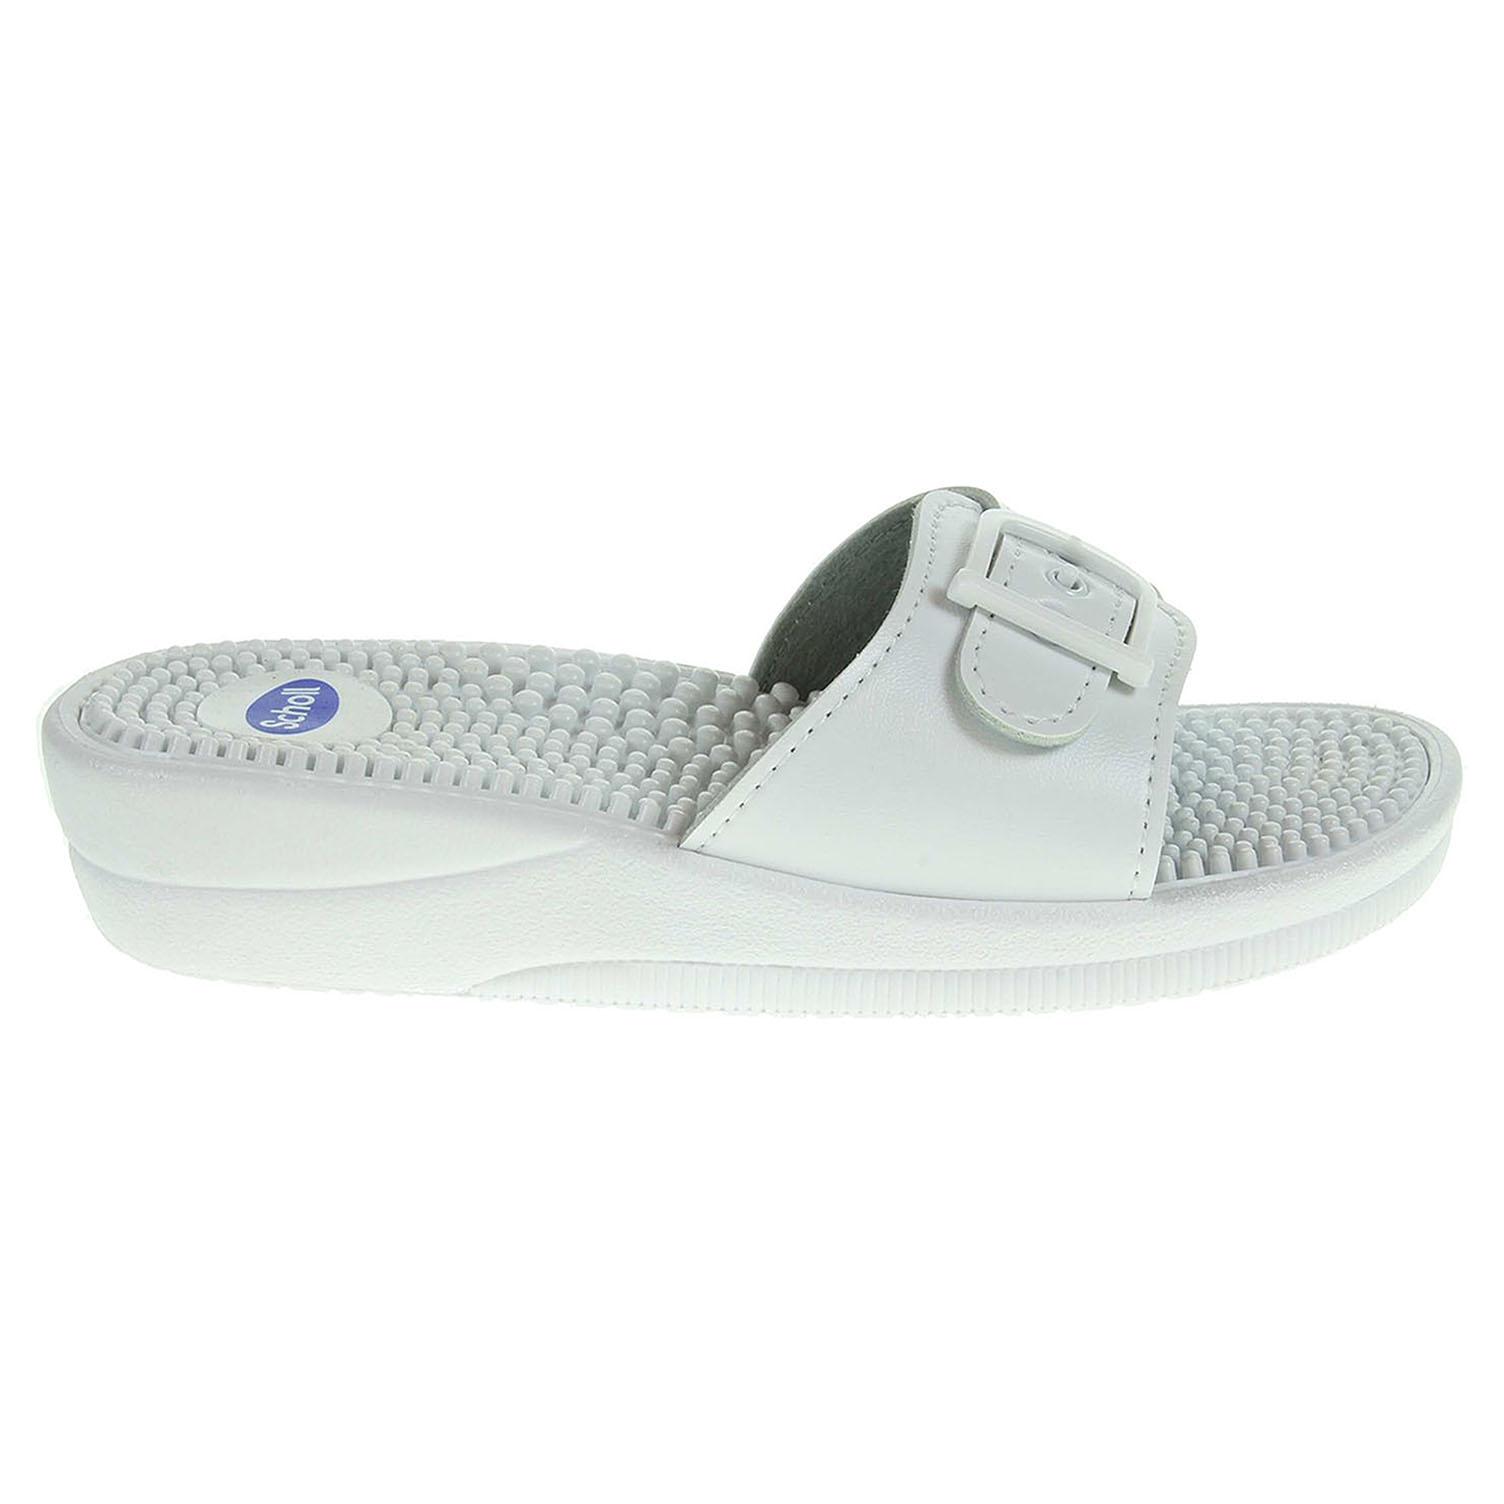 Ecco Scholl dámské pantofle F20054 1065 New Massage bílé 23400330